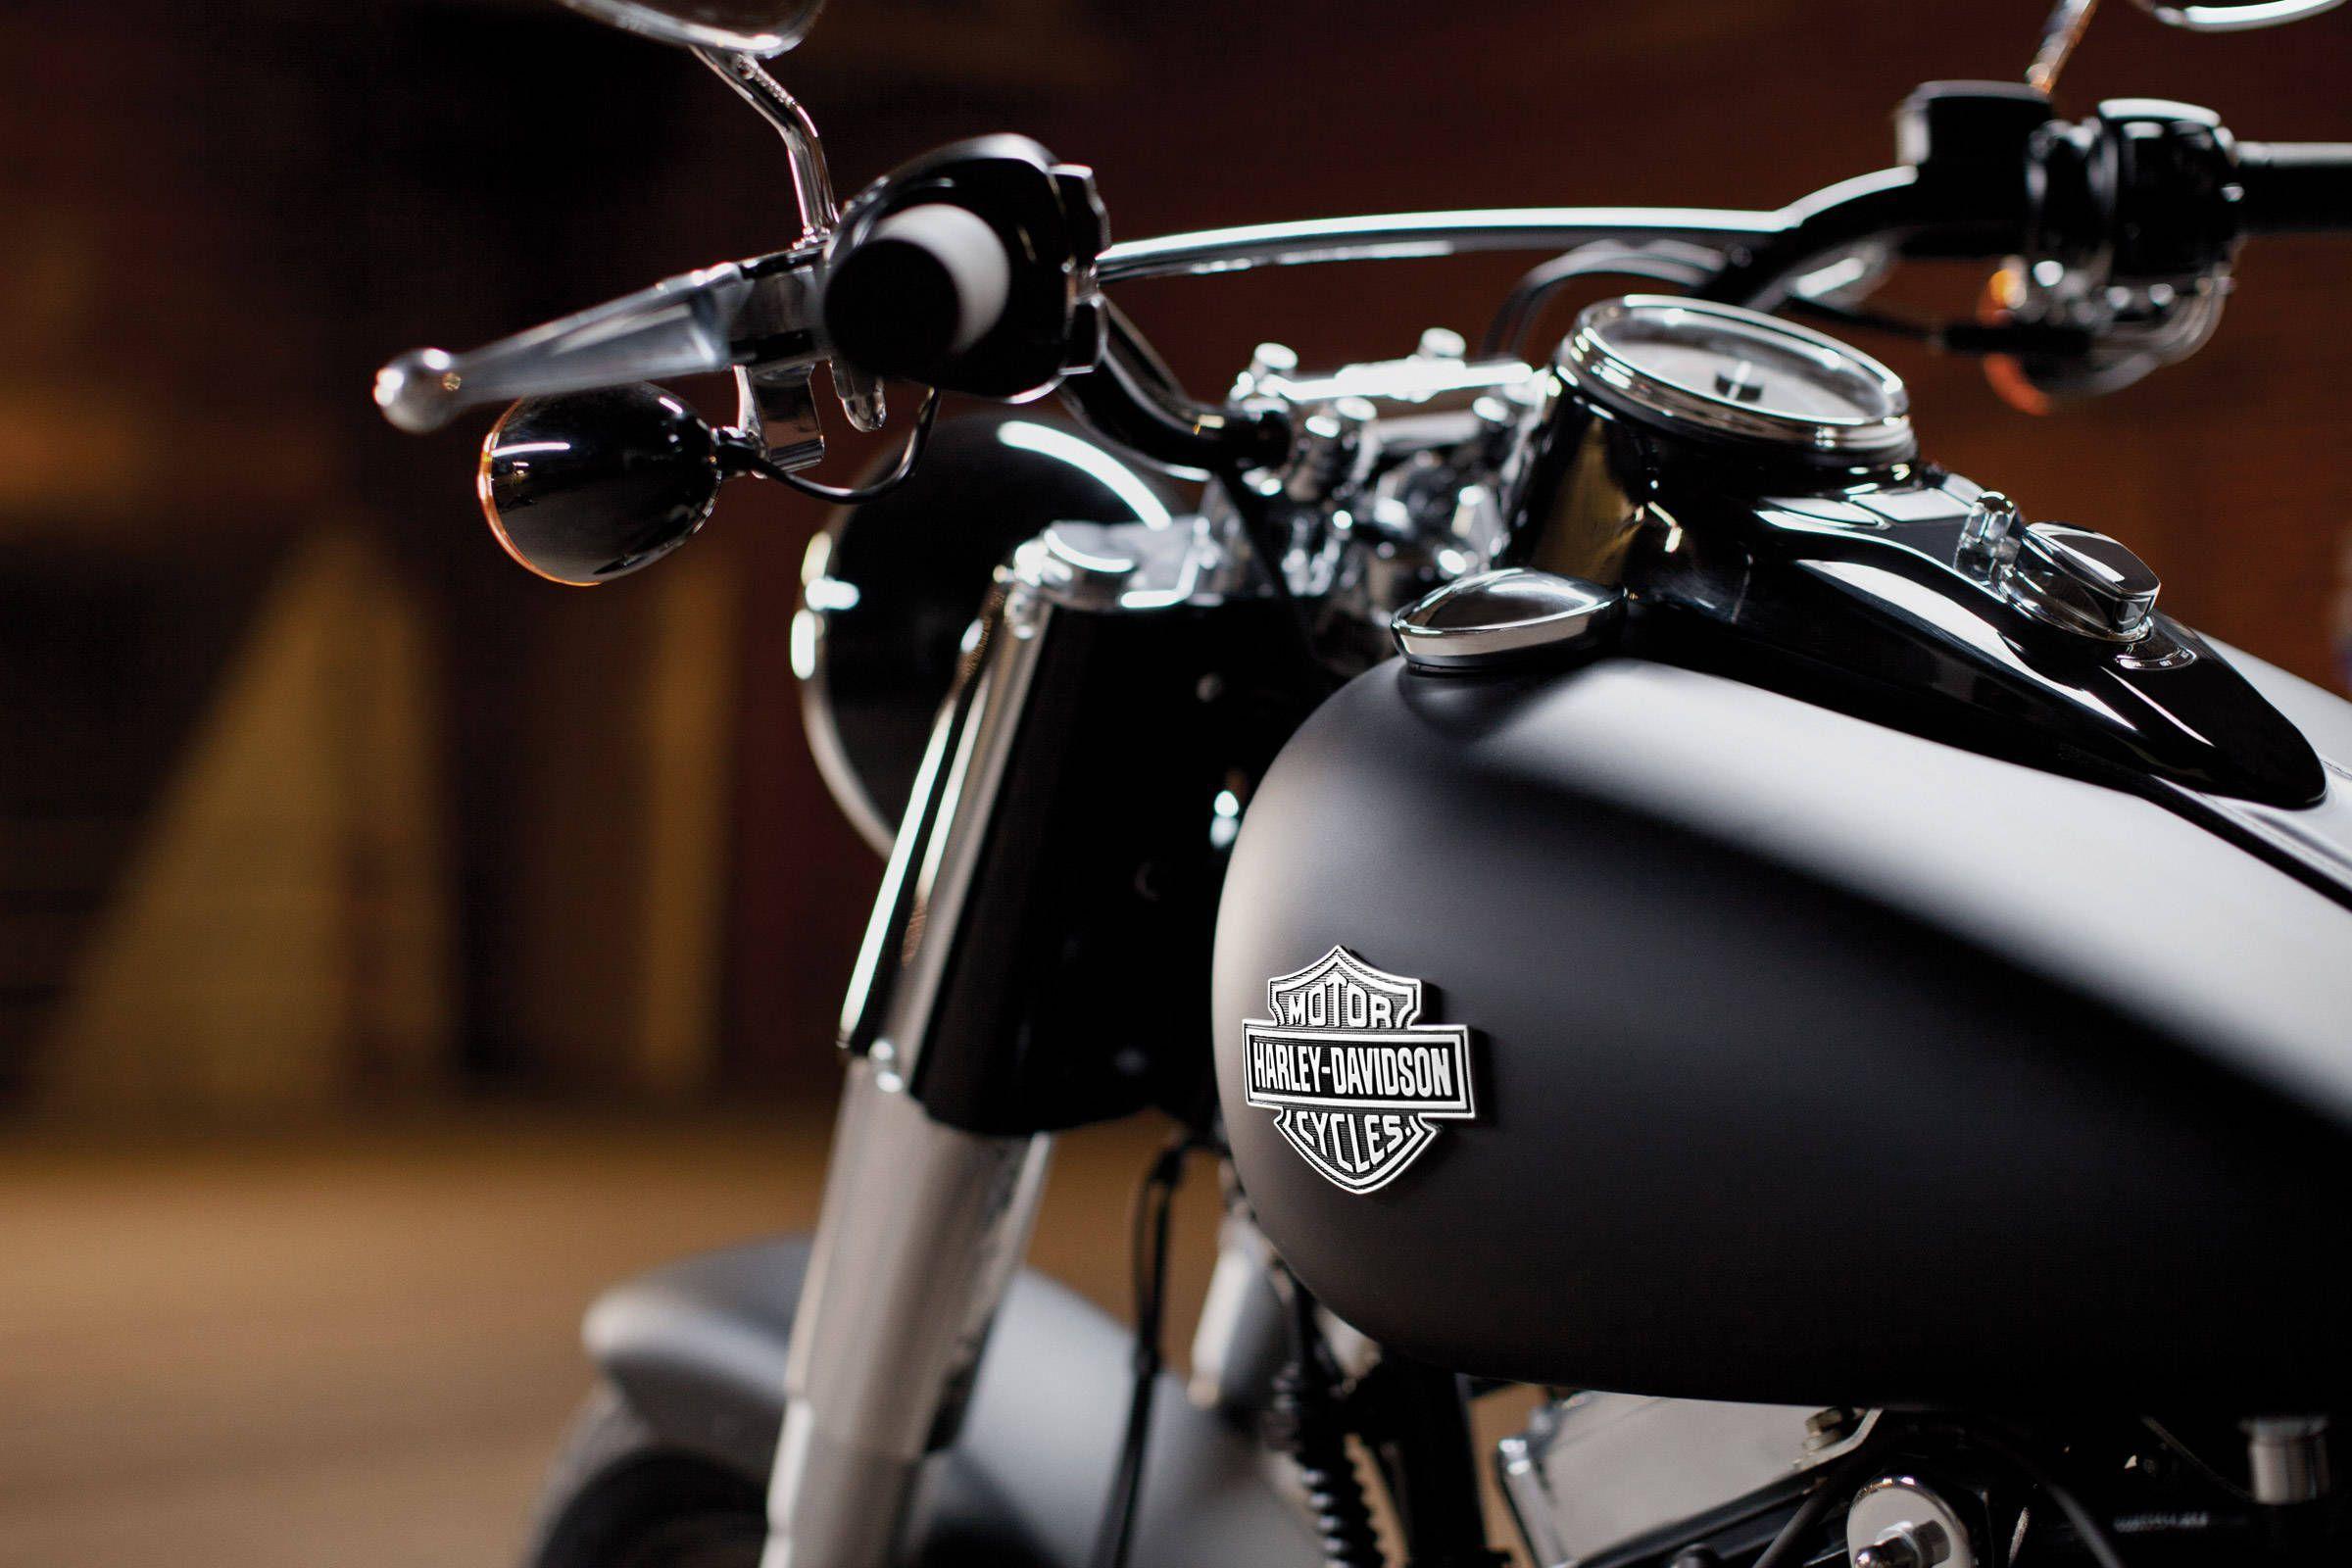 Images Of Pink Harley Davidson Motorcycle Wallpaper Calto Free Desktop Wallpapers Cave